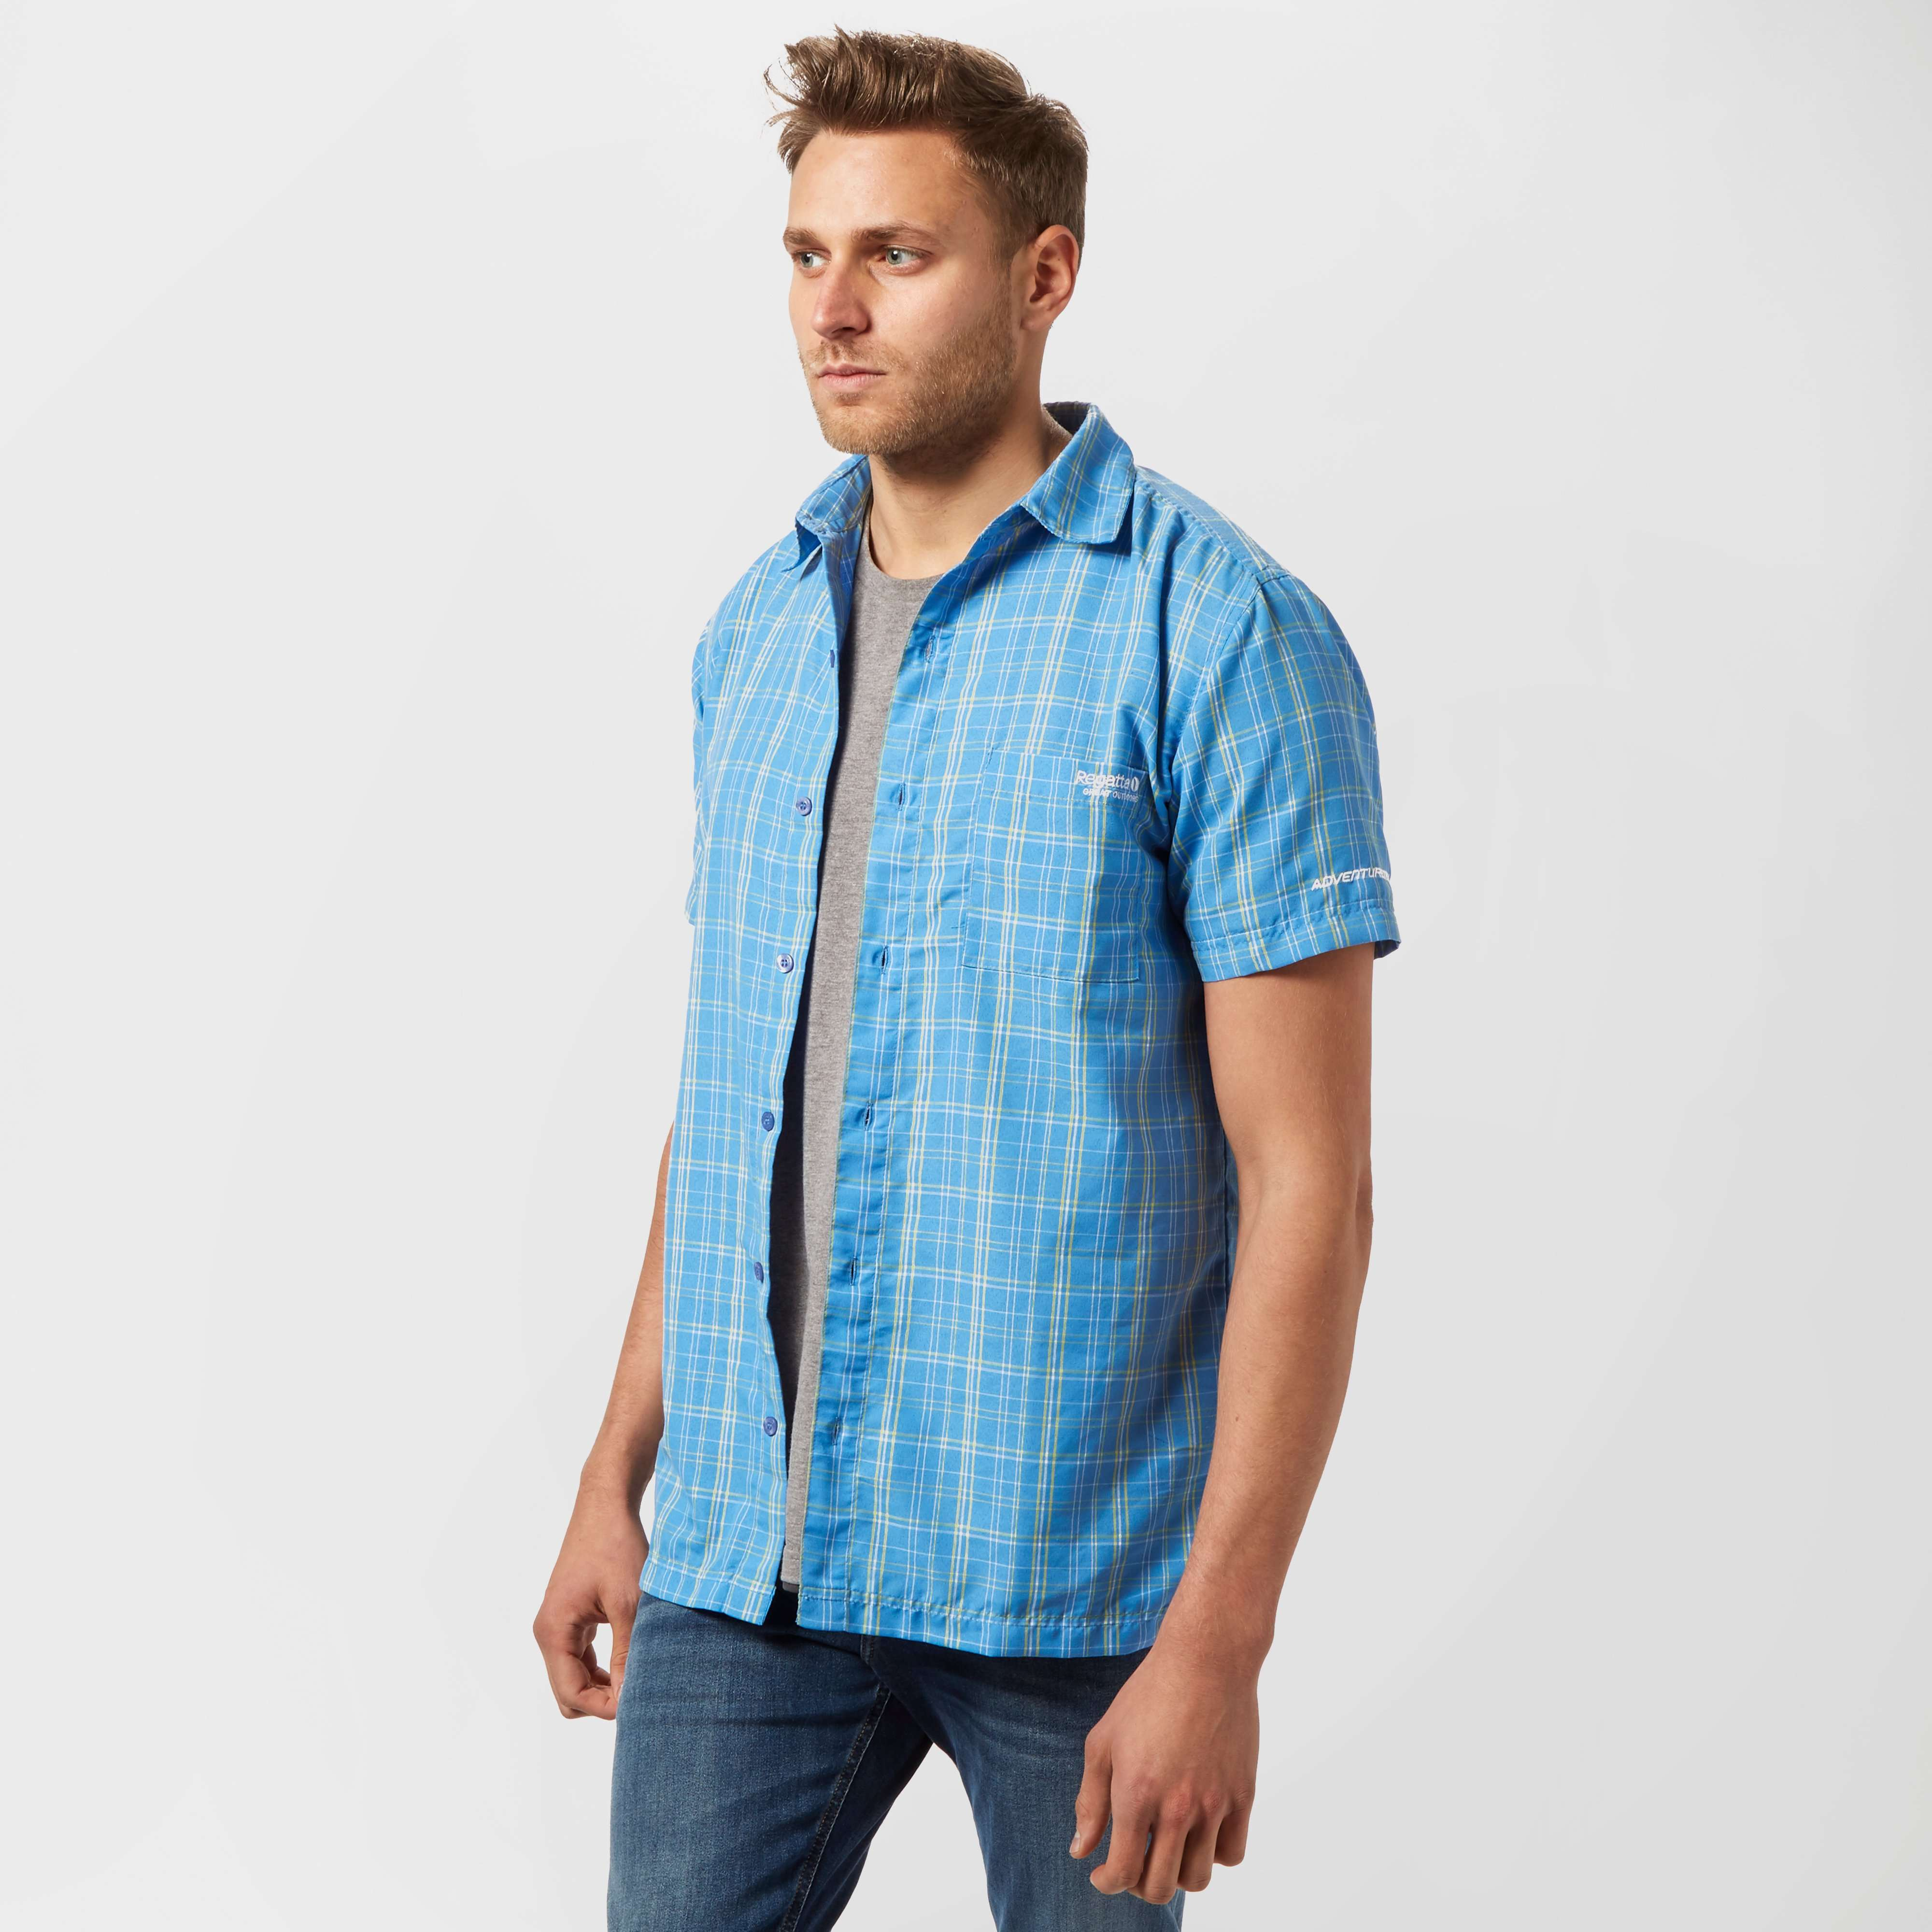 REGATTA Men's Shelton Short Sleeve Shirt